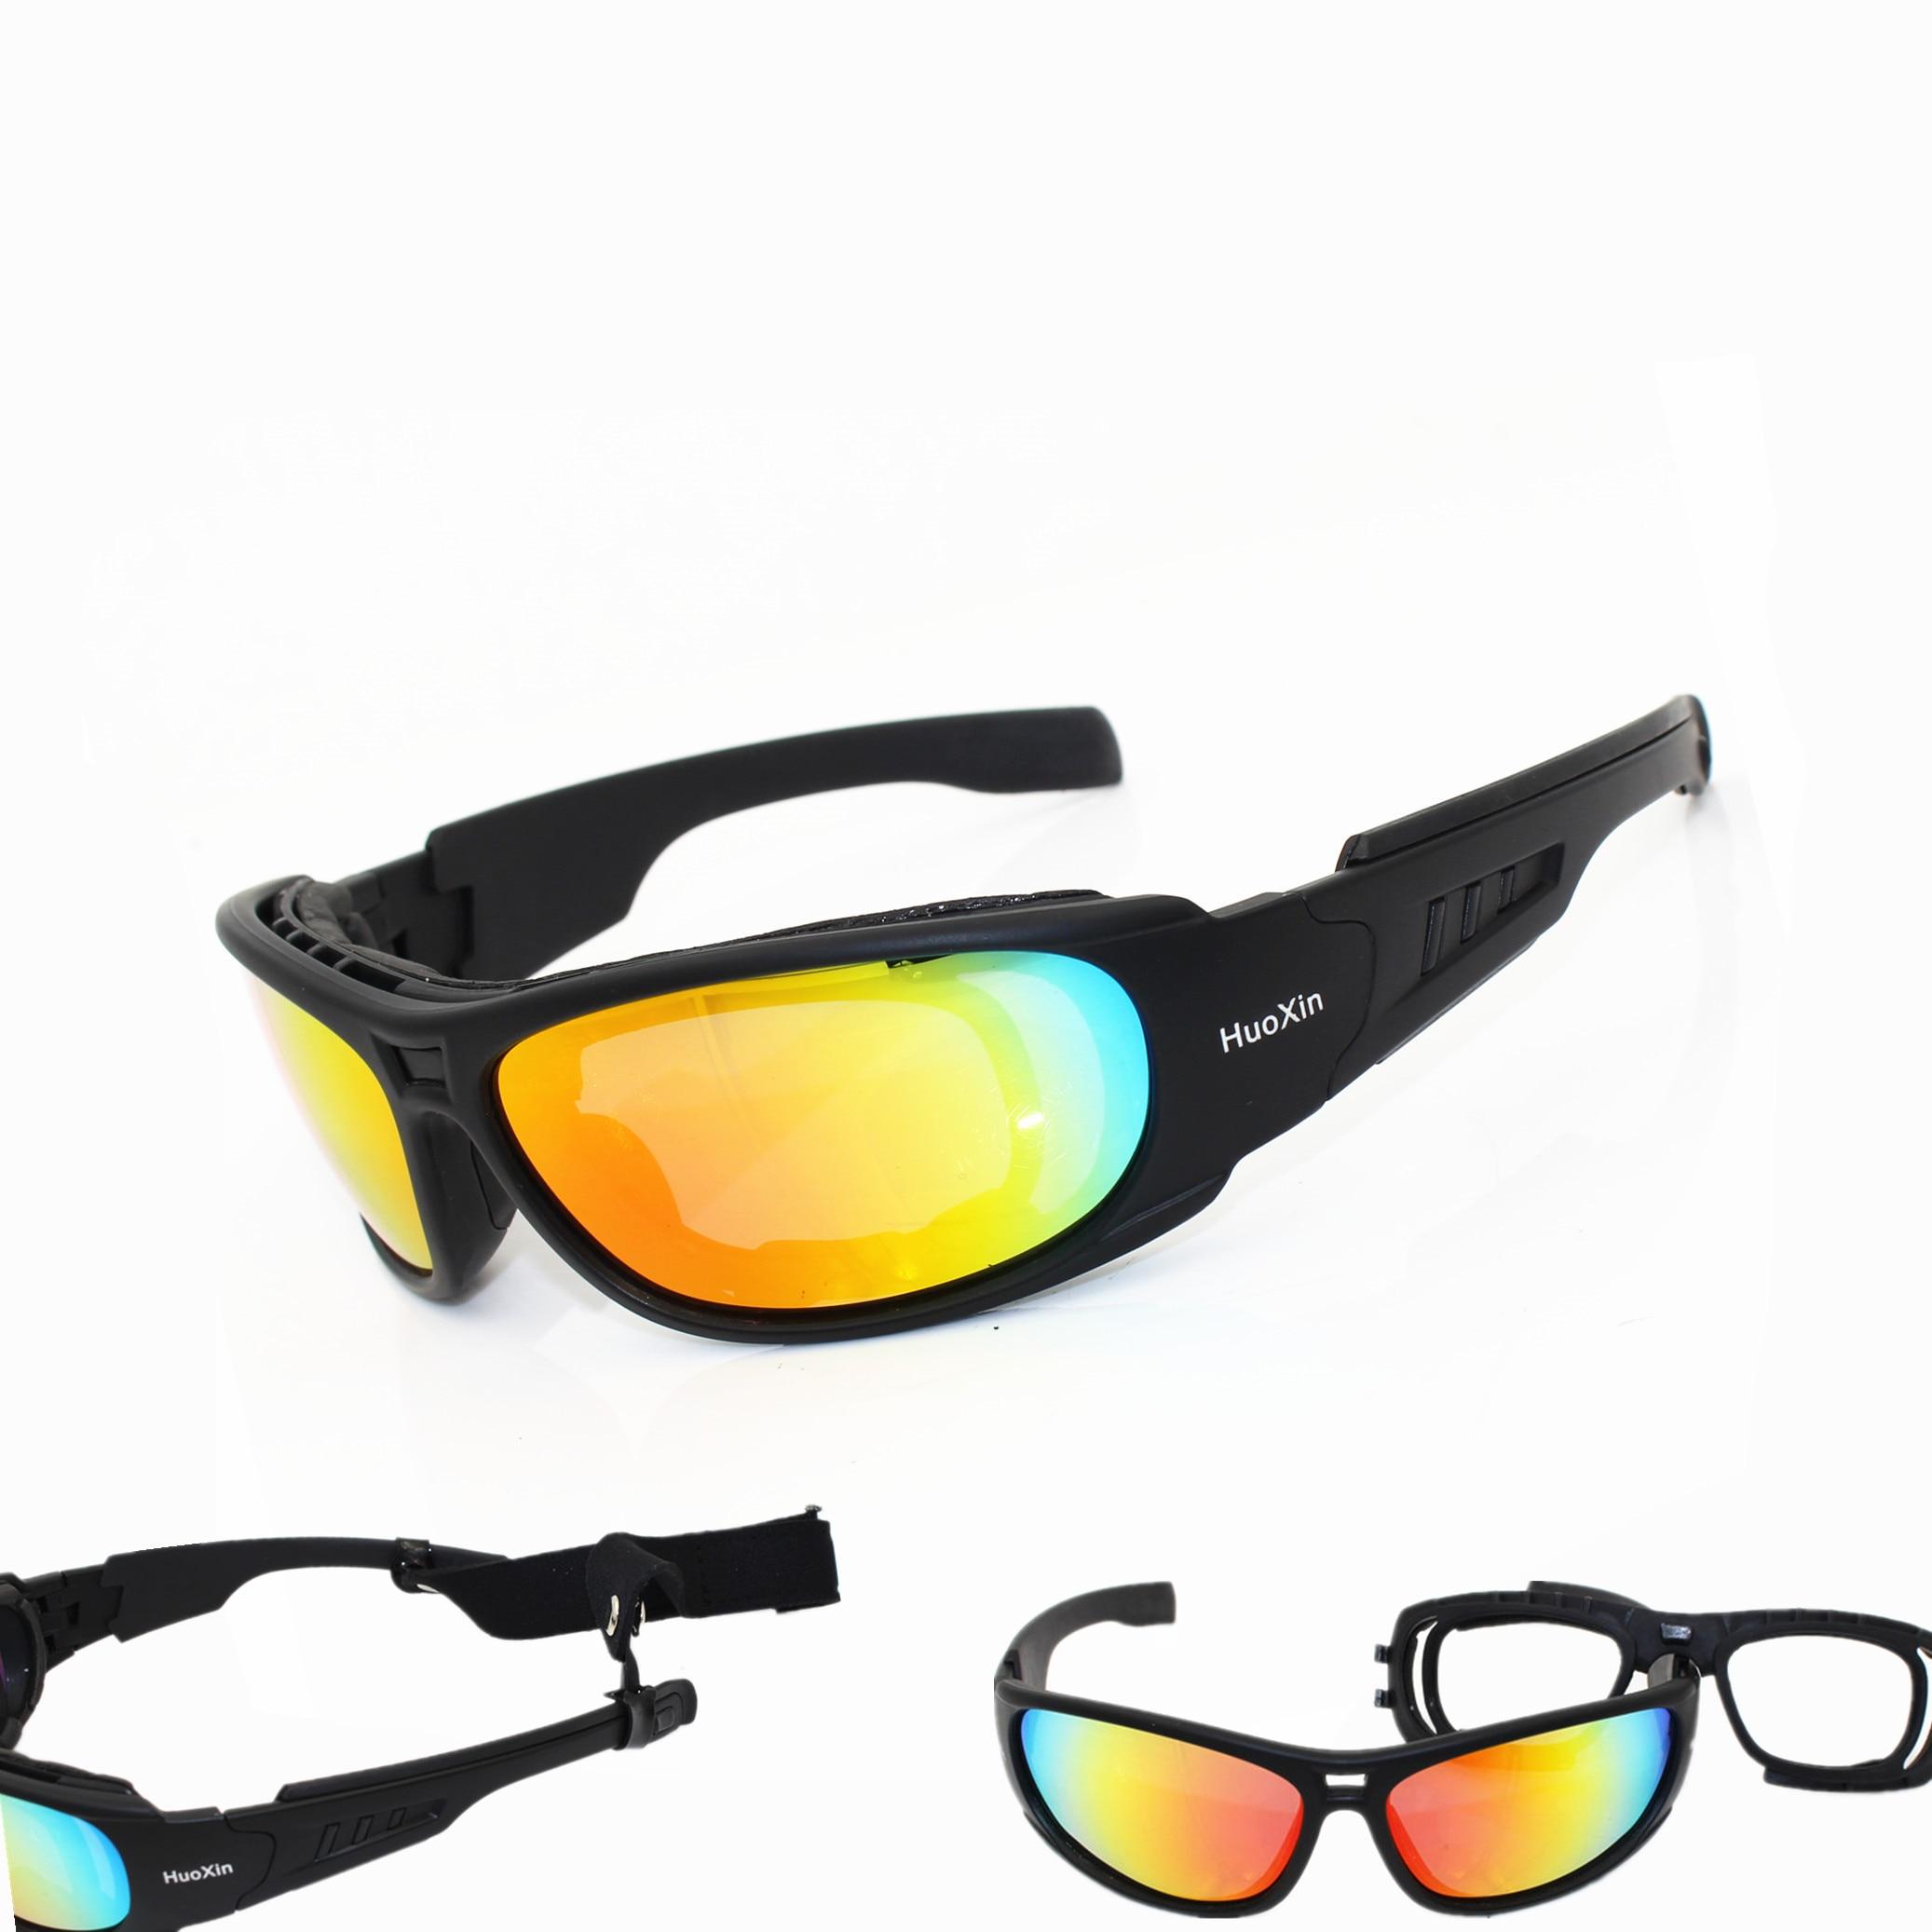 Tactical Goggles Sunglasses Men Military C6 Sun glasses for Mens War Game Tactical Glasses Outdoor